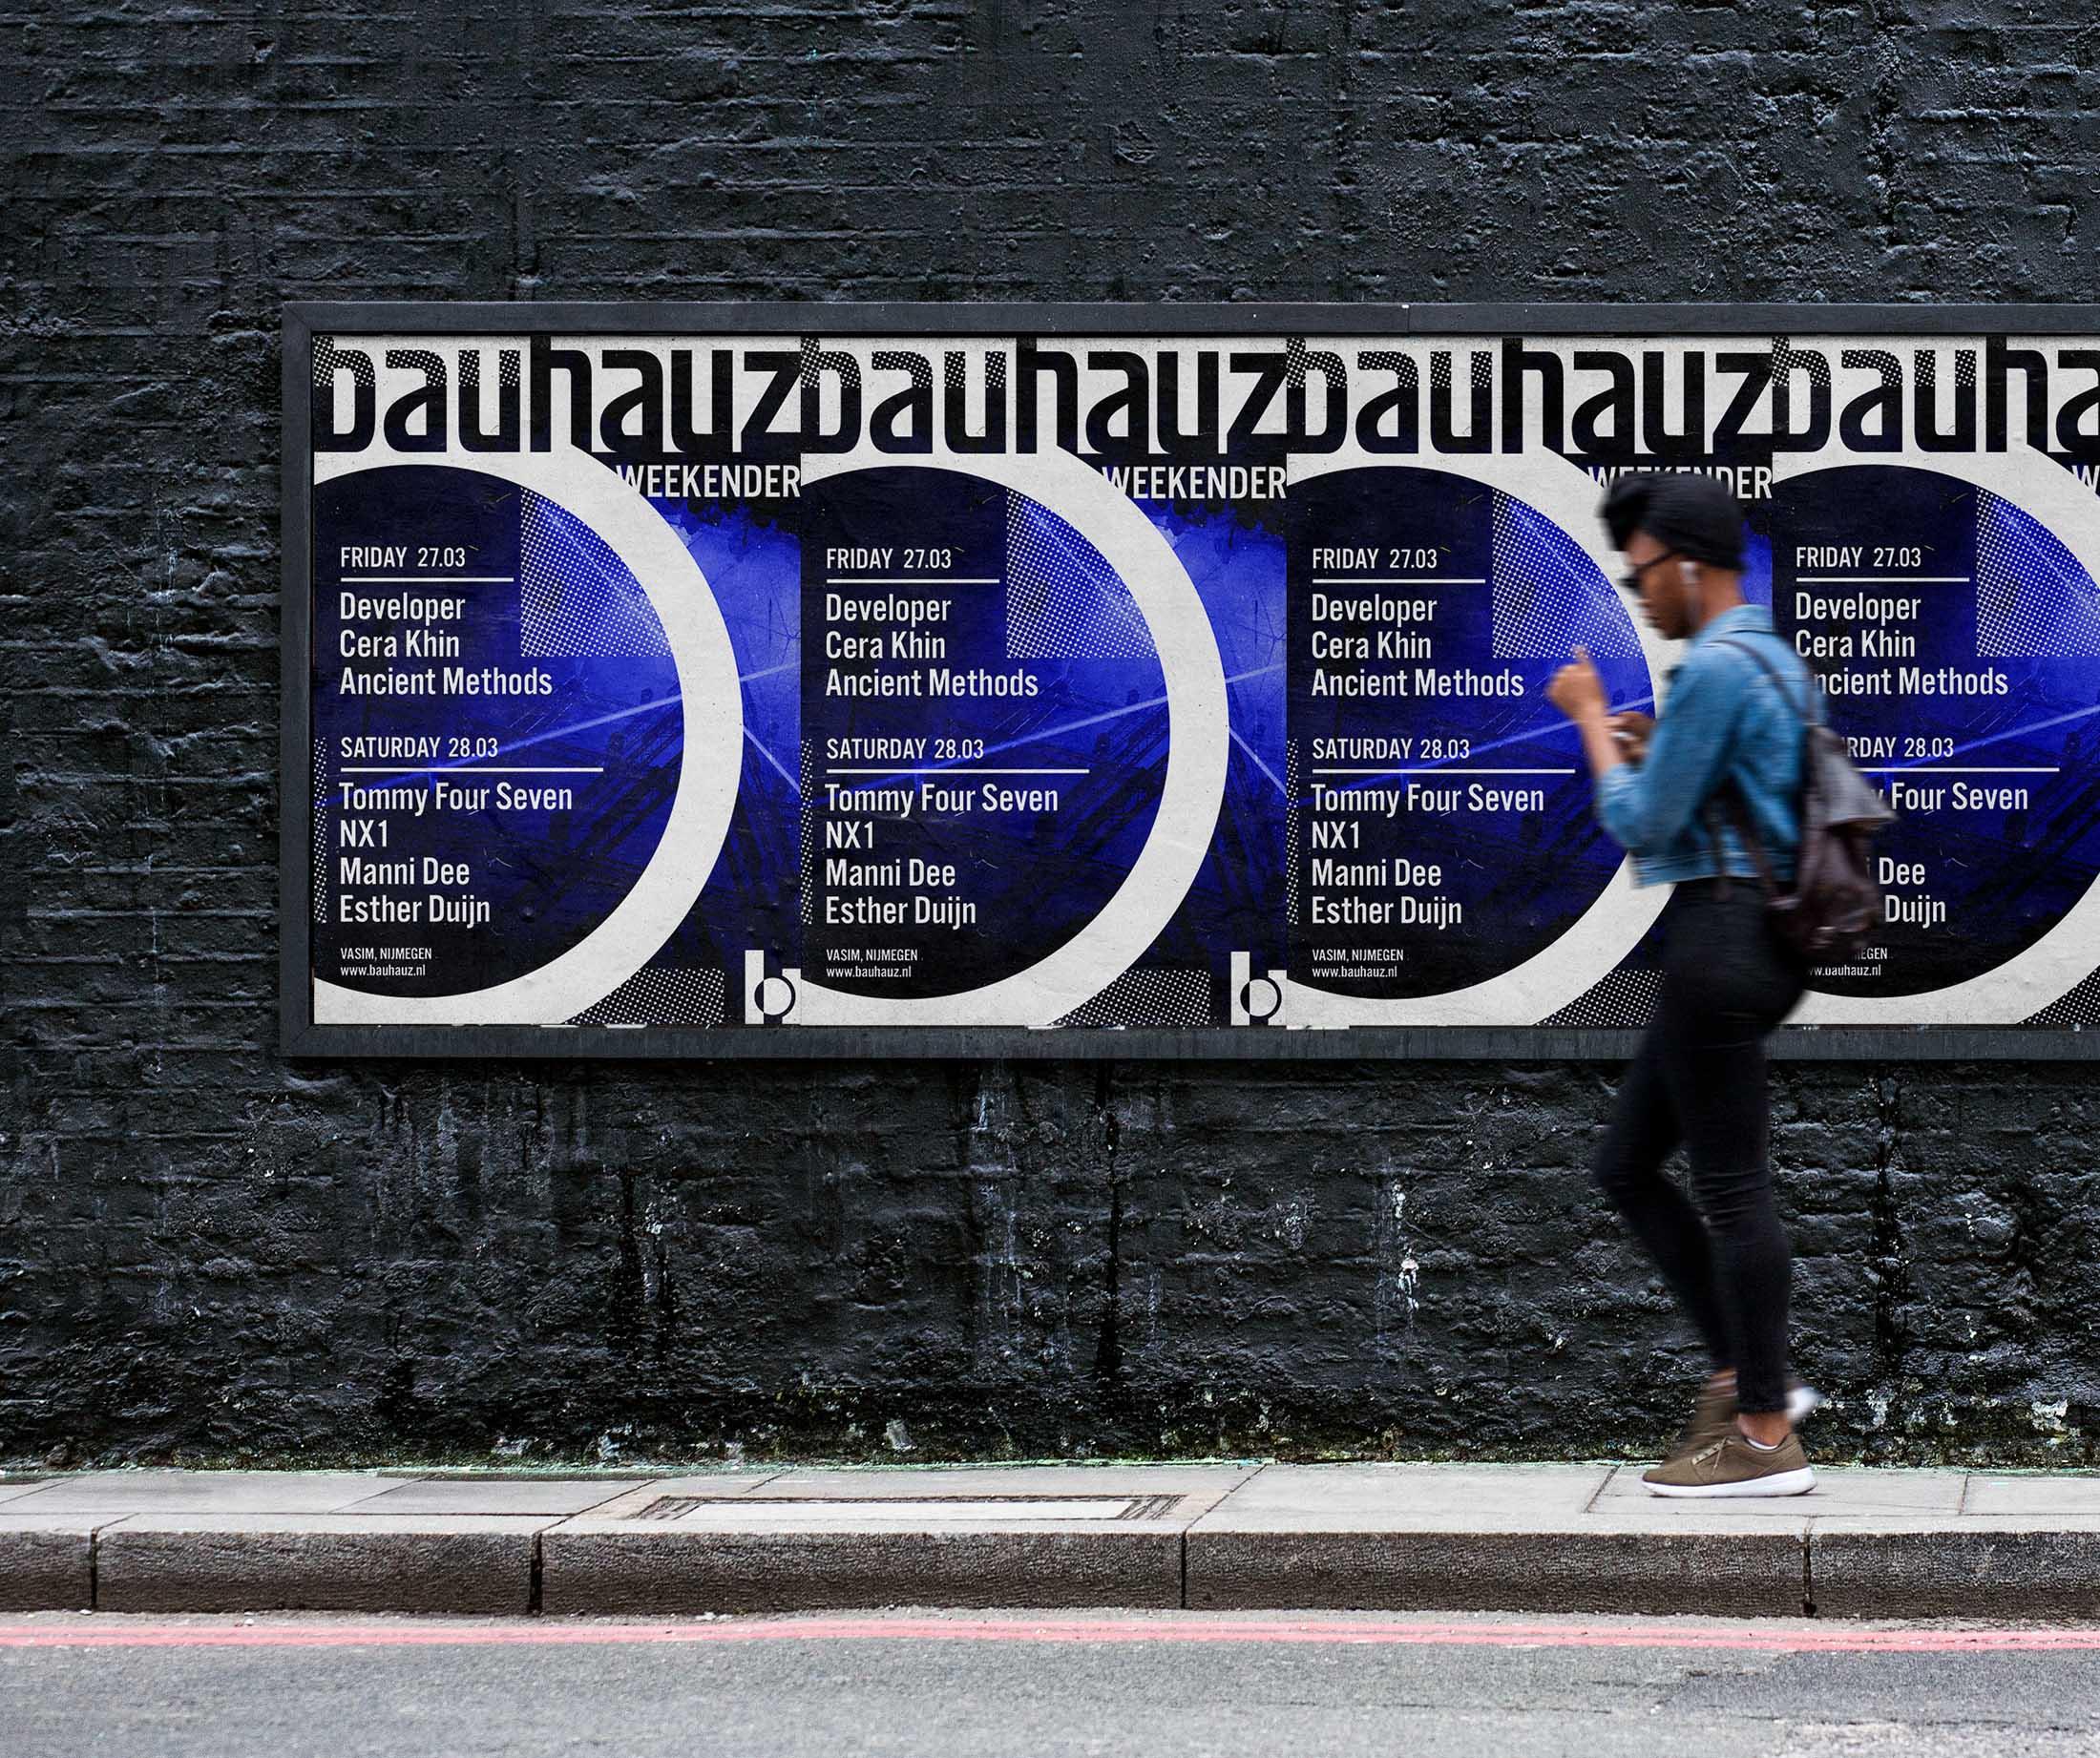 Bauhauz Weekender Artwork Posters